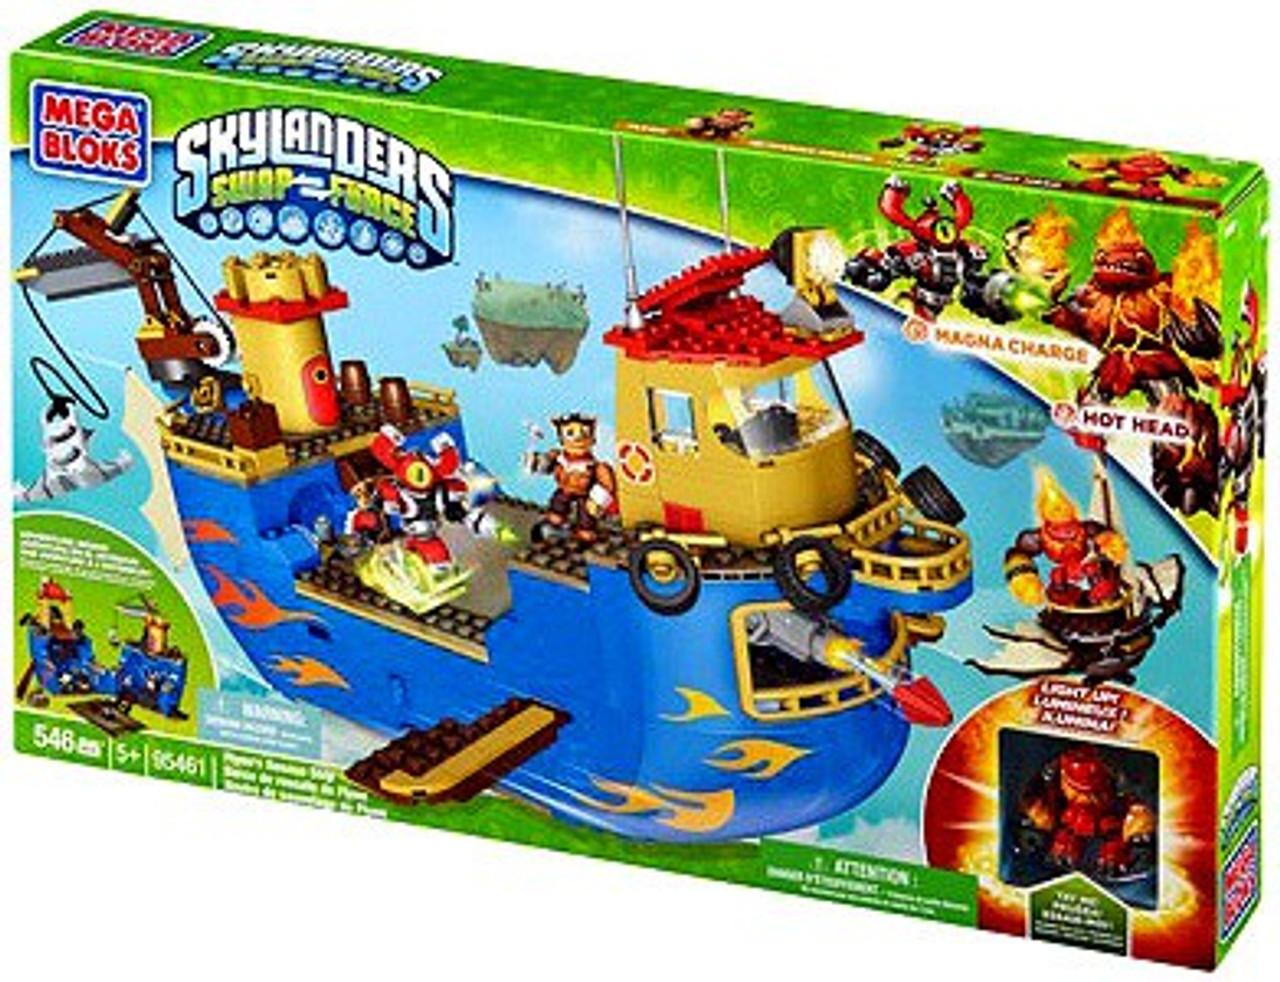 Mega Bloks Skylanders Swap Force Flynn's Rescue Ship Set #95461